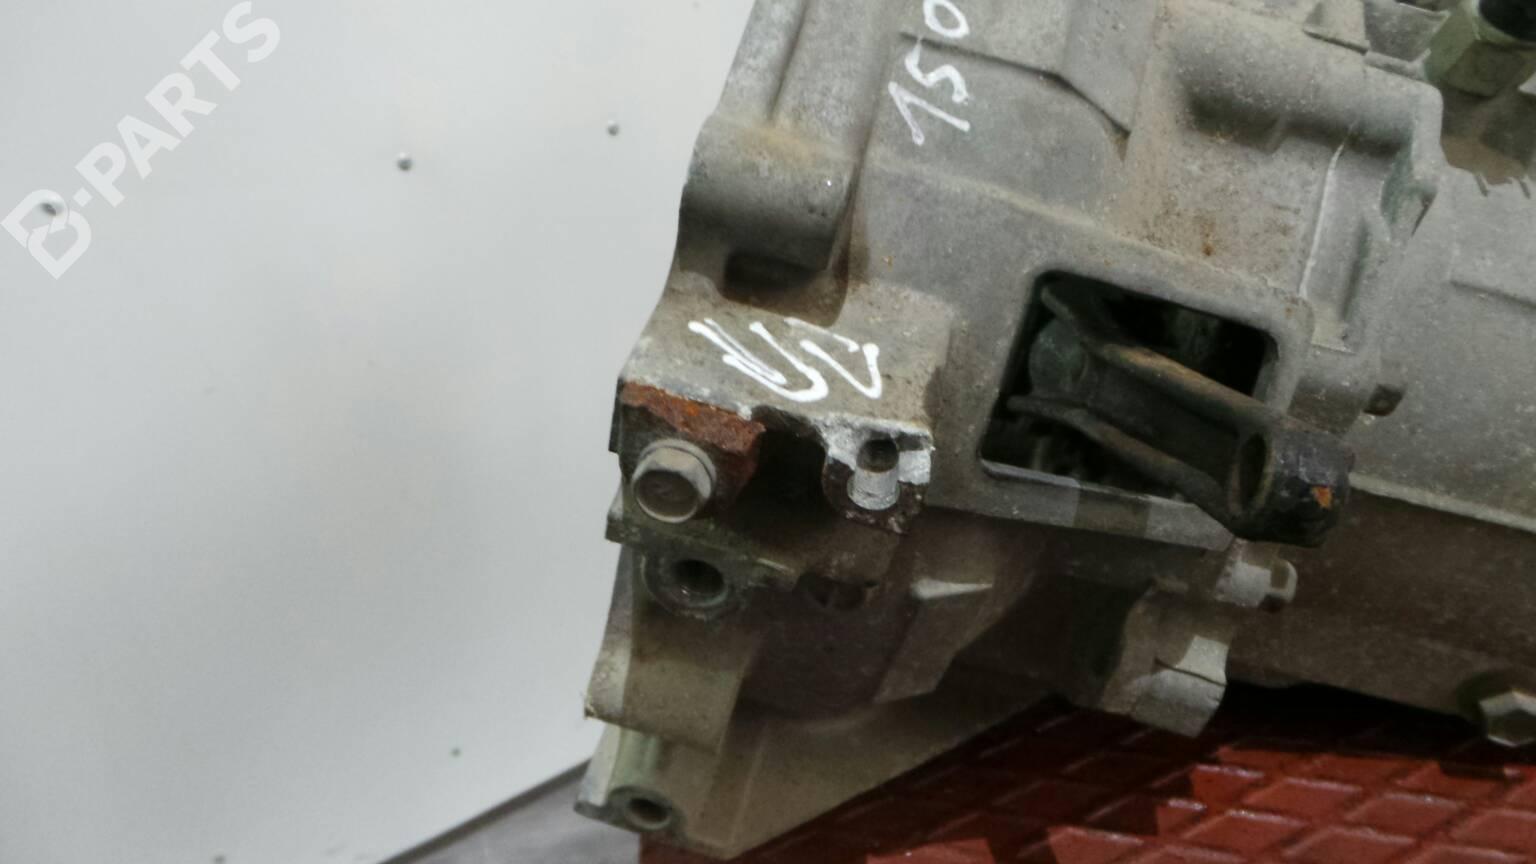 Manual Gearbox Mitsubishi Lancer Vi Cj Cp 13 12v Ck1a 57113 2003 Parts Diagram